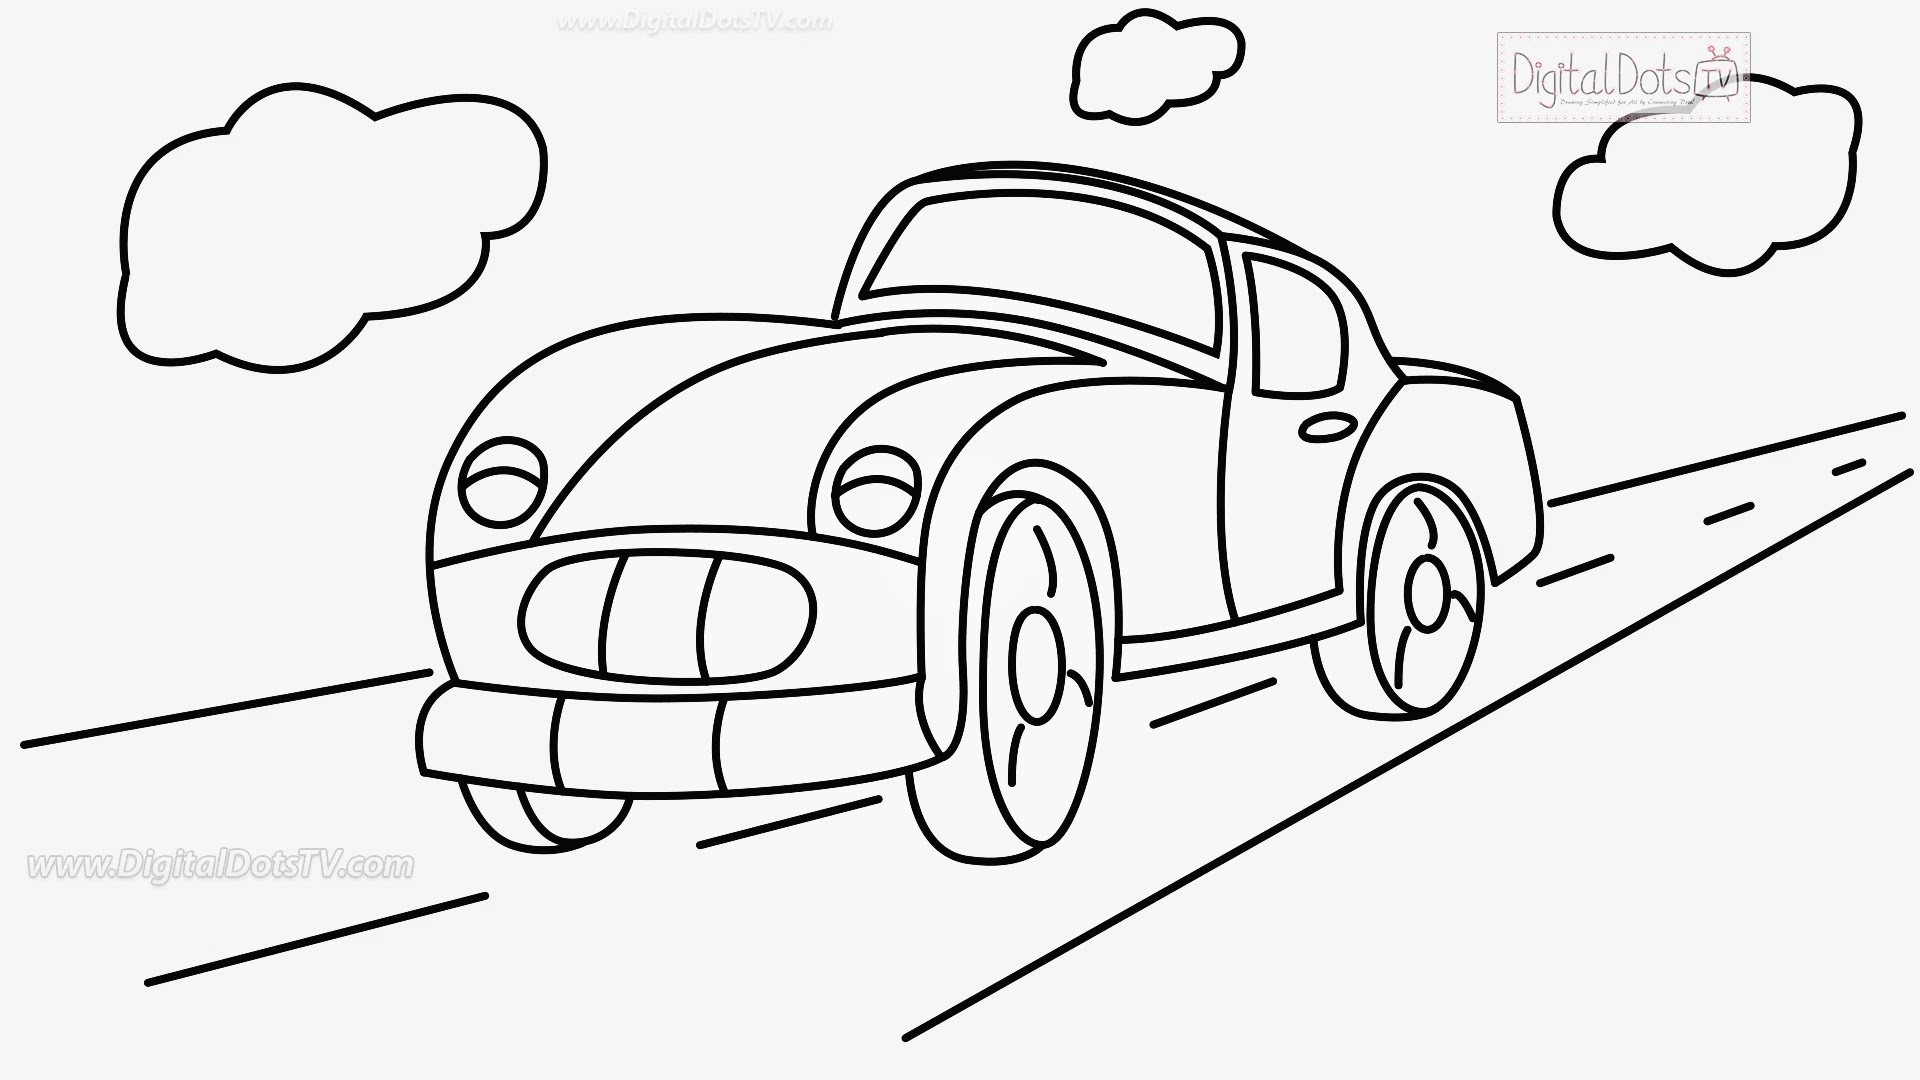 Drawn vehicle caricature Draw Step Cartoons Step Step